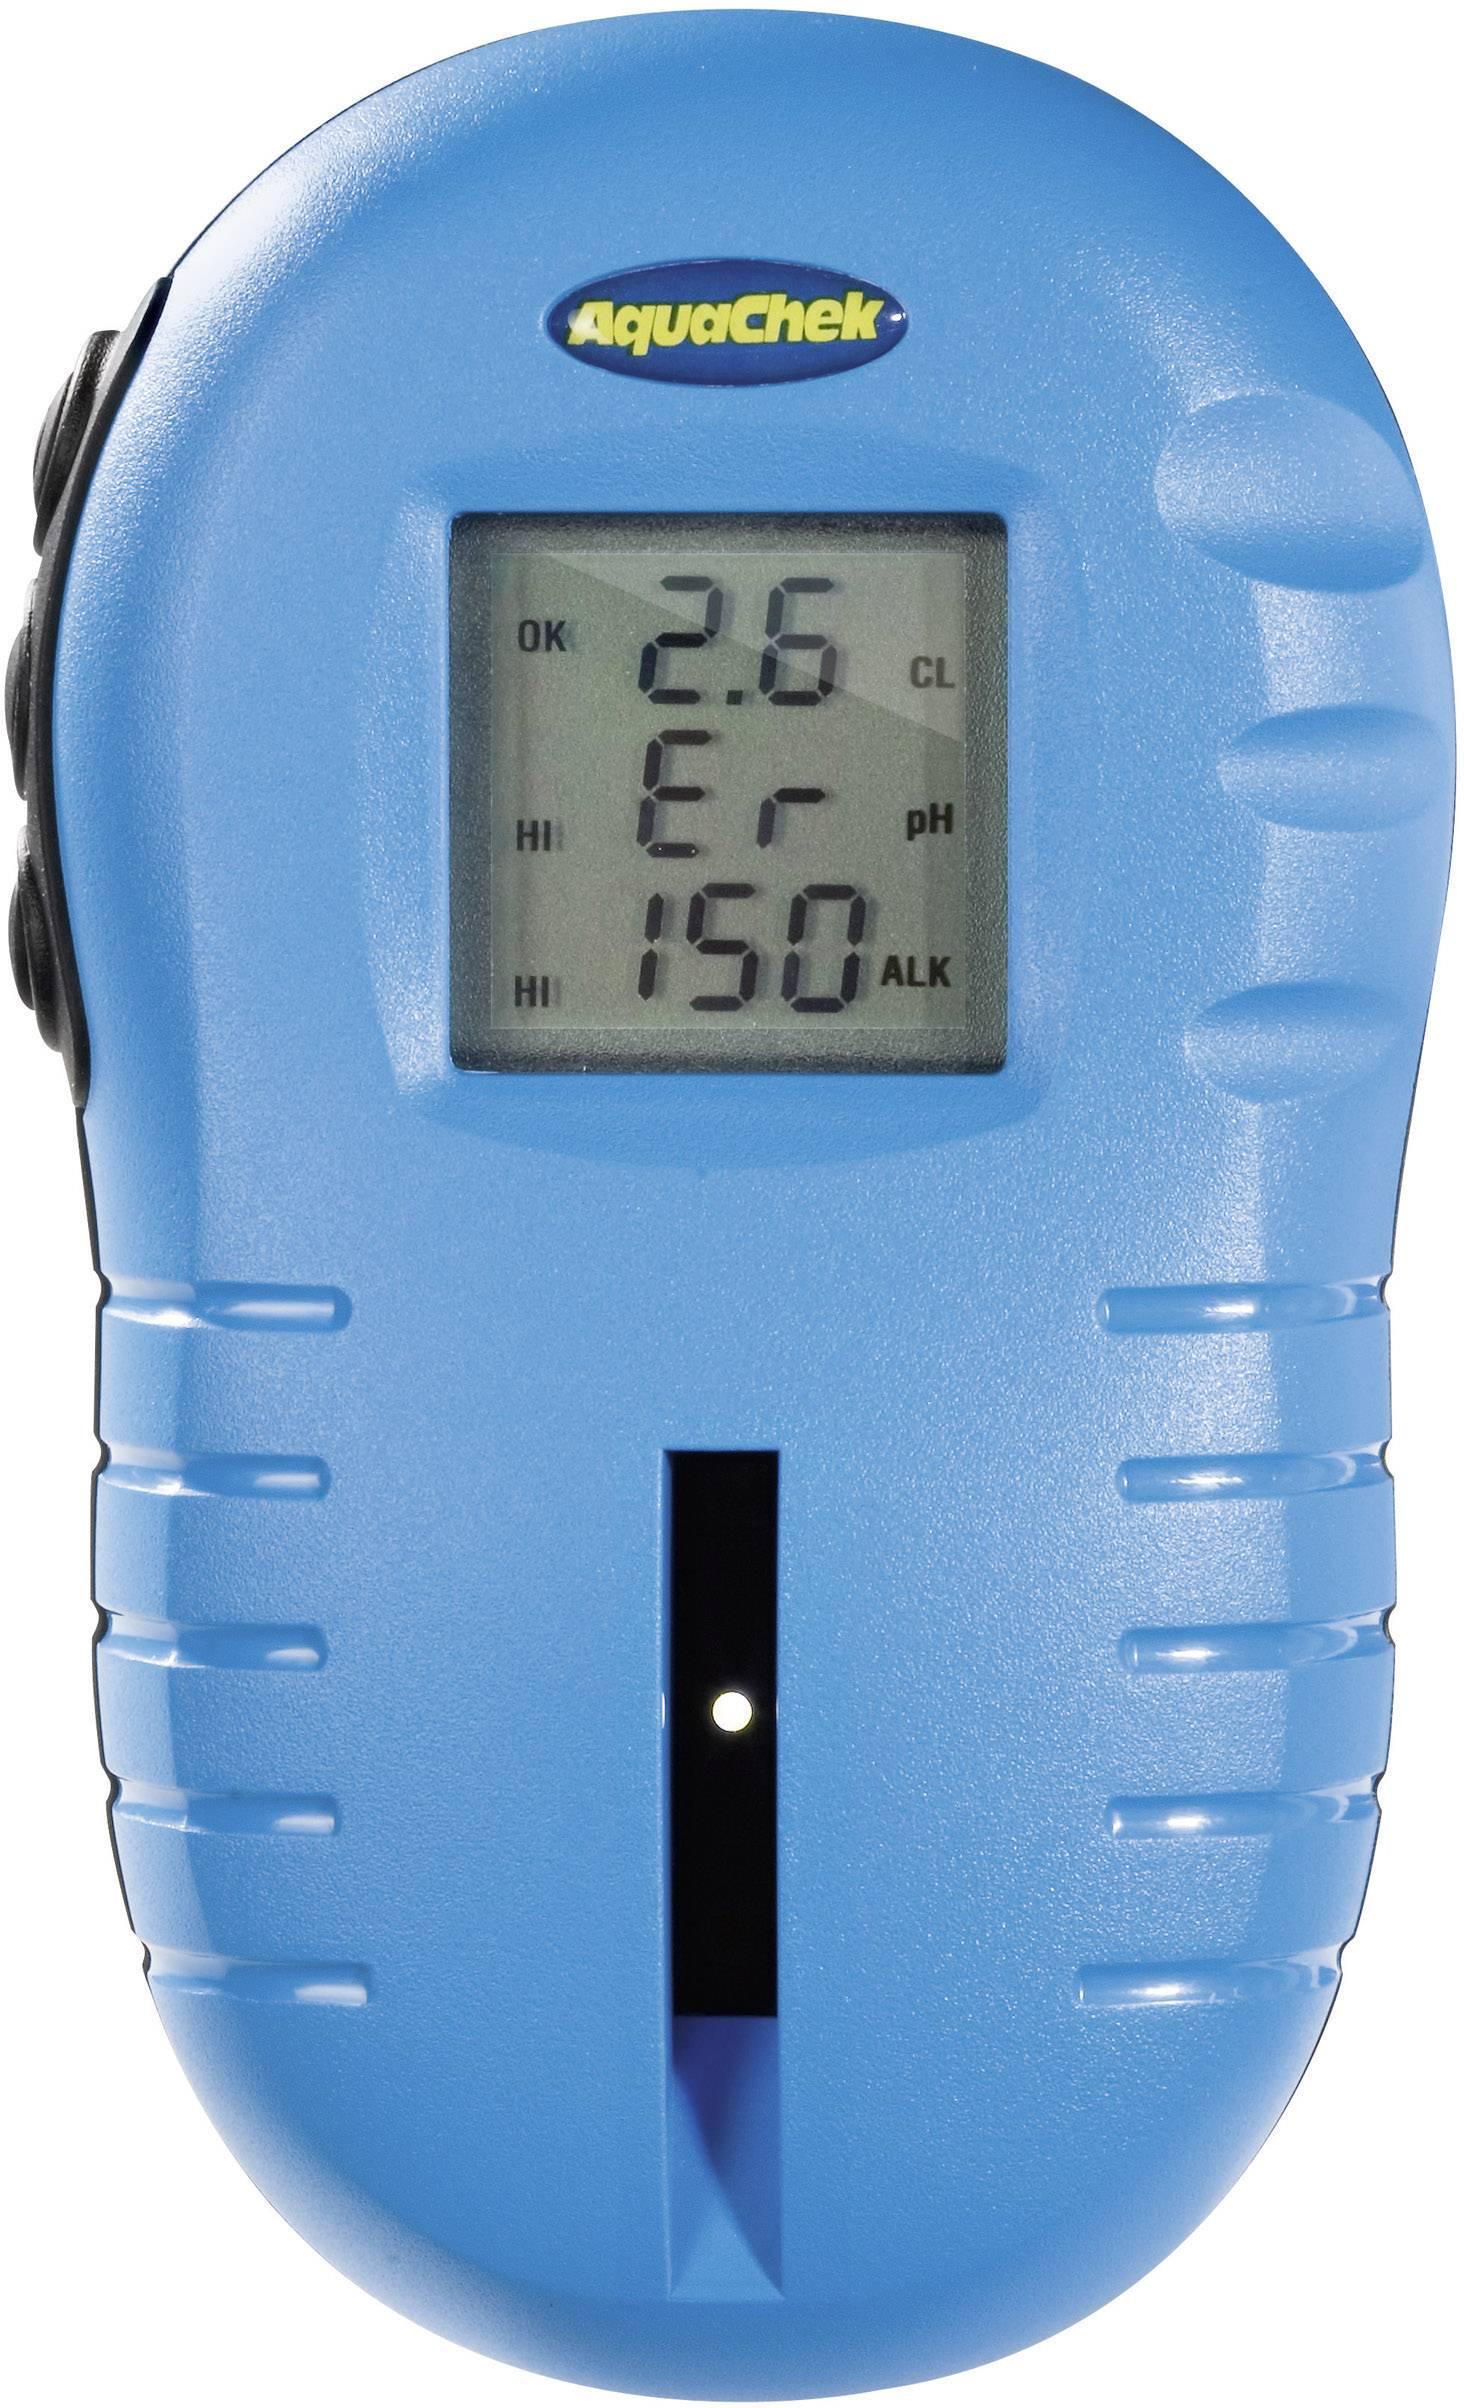 Digitální tester kvality vody AquaChek TruTest, 6,1 - 8,8 pH